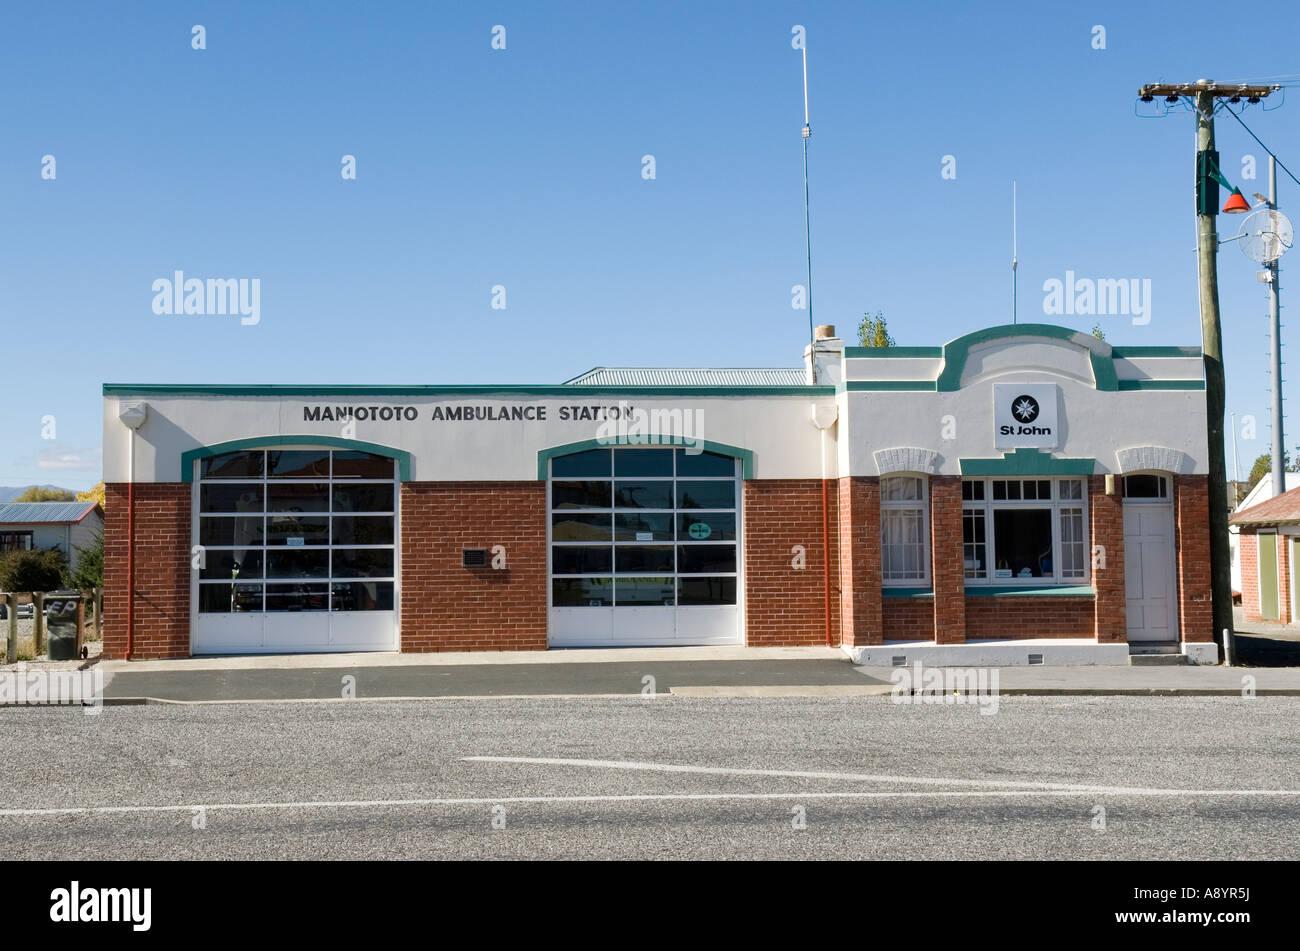 Maniototo St John Ambulance centre Ranfurly New Zealand - Stock Image